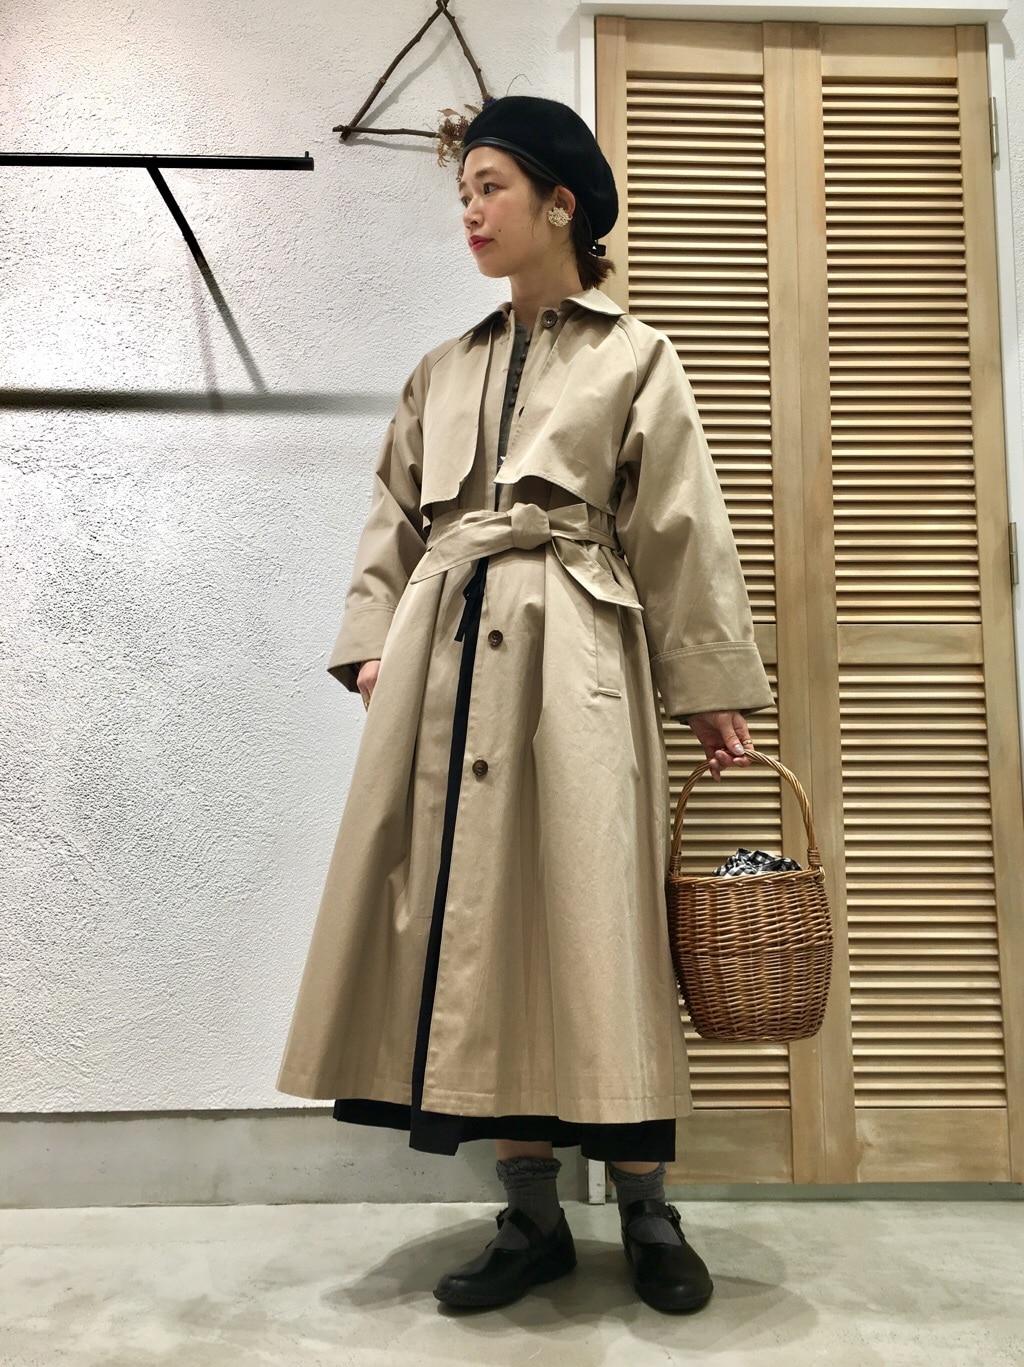 chambre de charme 横浜ジョイナス 身長:160cm 2021.01.29